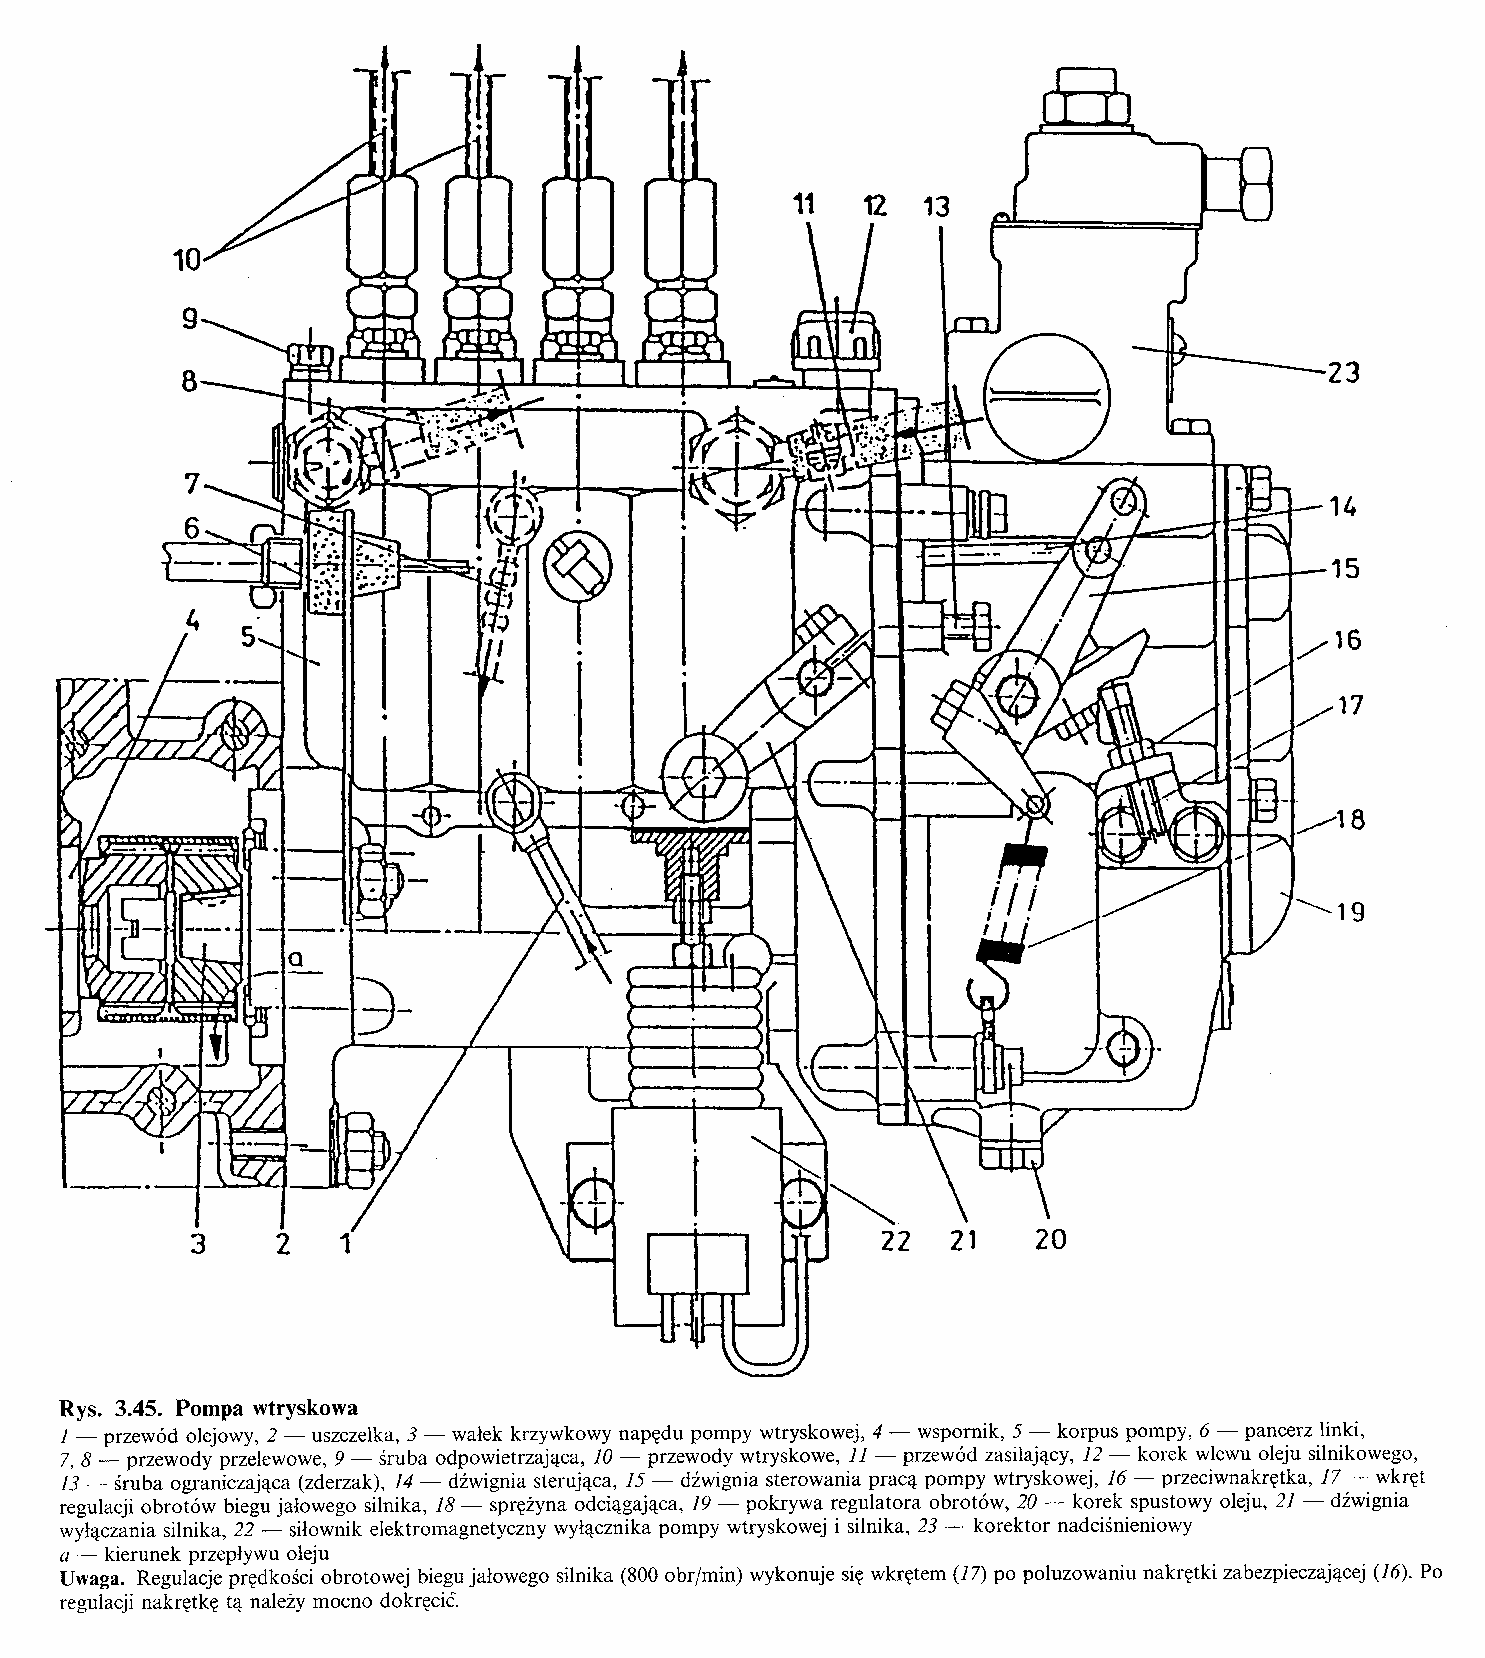 Daewoo LUBLIN 2.4 diesel ga�nie, gdy zimny silnik